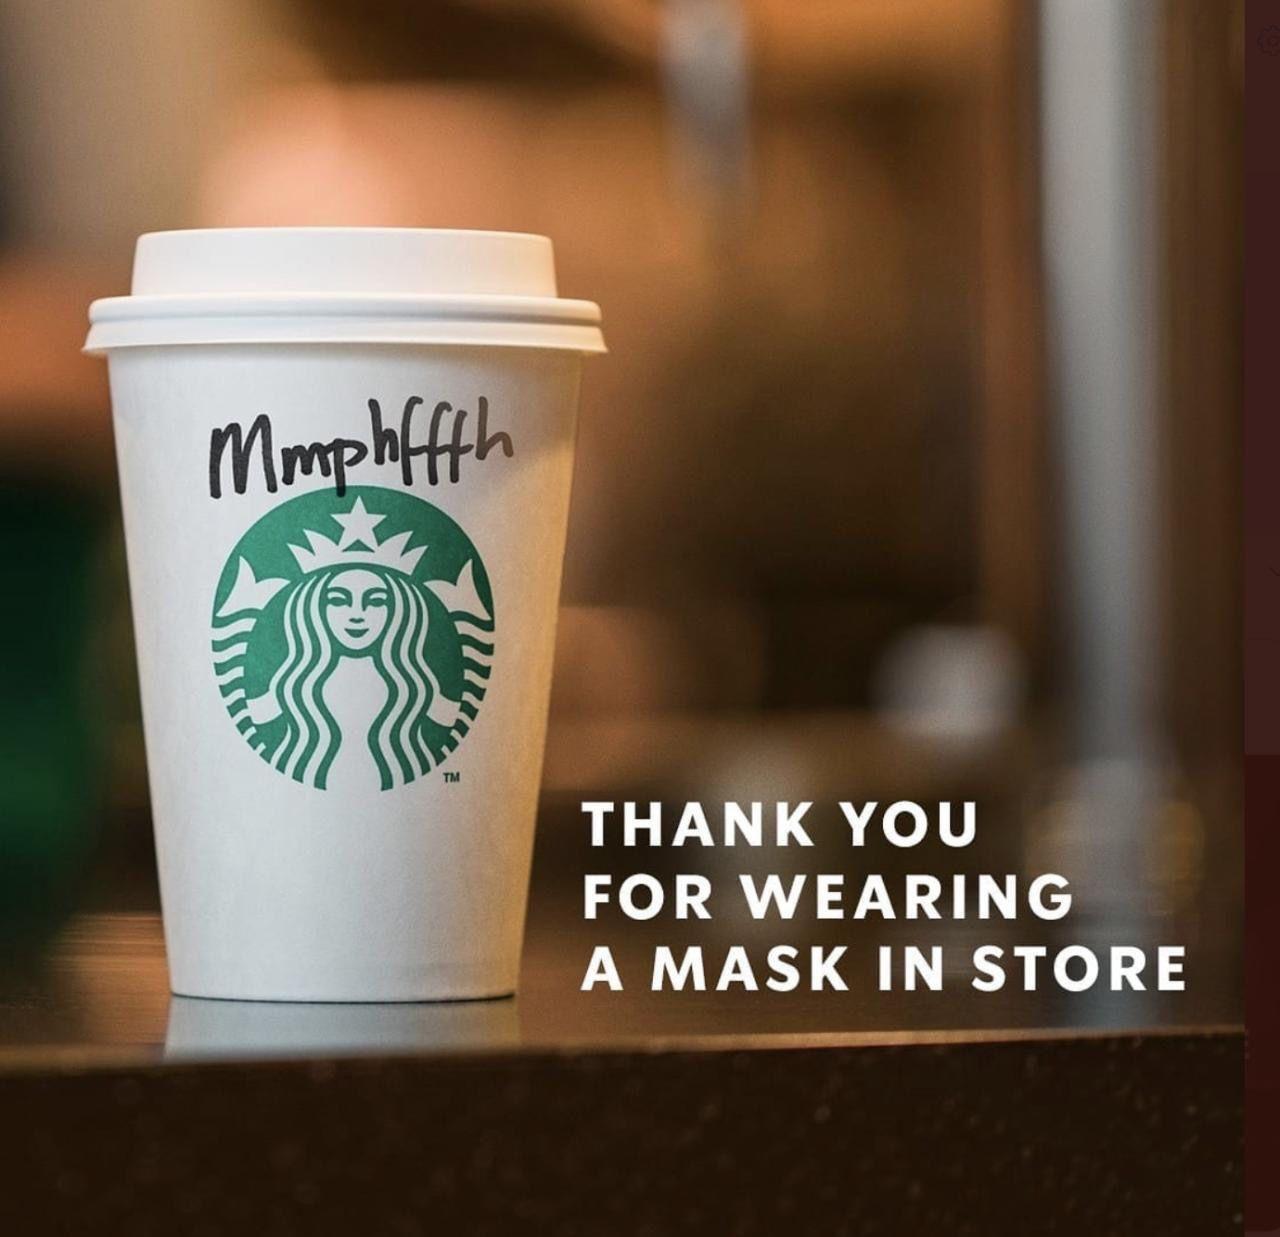 Starbucks: Wear mask